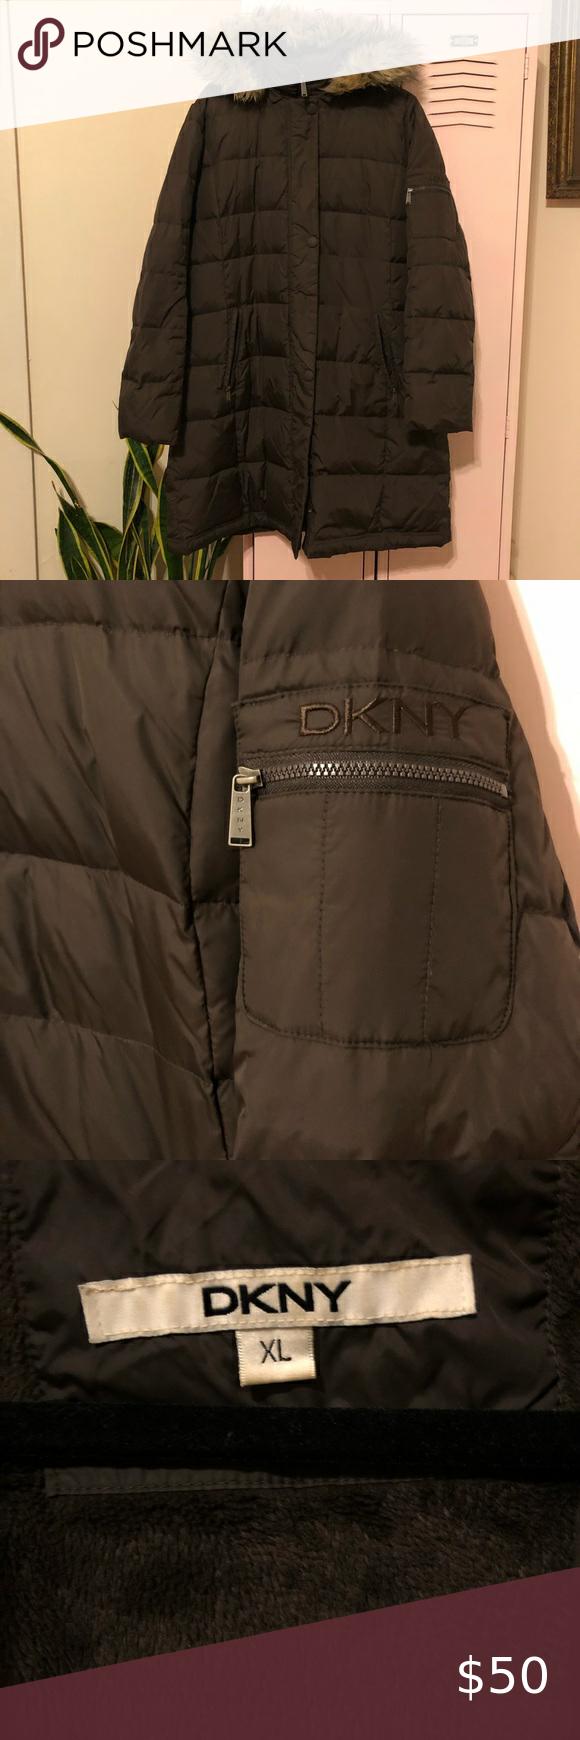 Dkny Puffer Coat In 2020 Black Puffer Coat Puffer Coat Black Puffy Coat [ 1740 x 580 Pixel ]